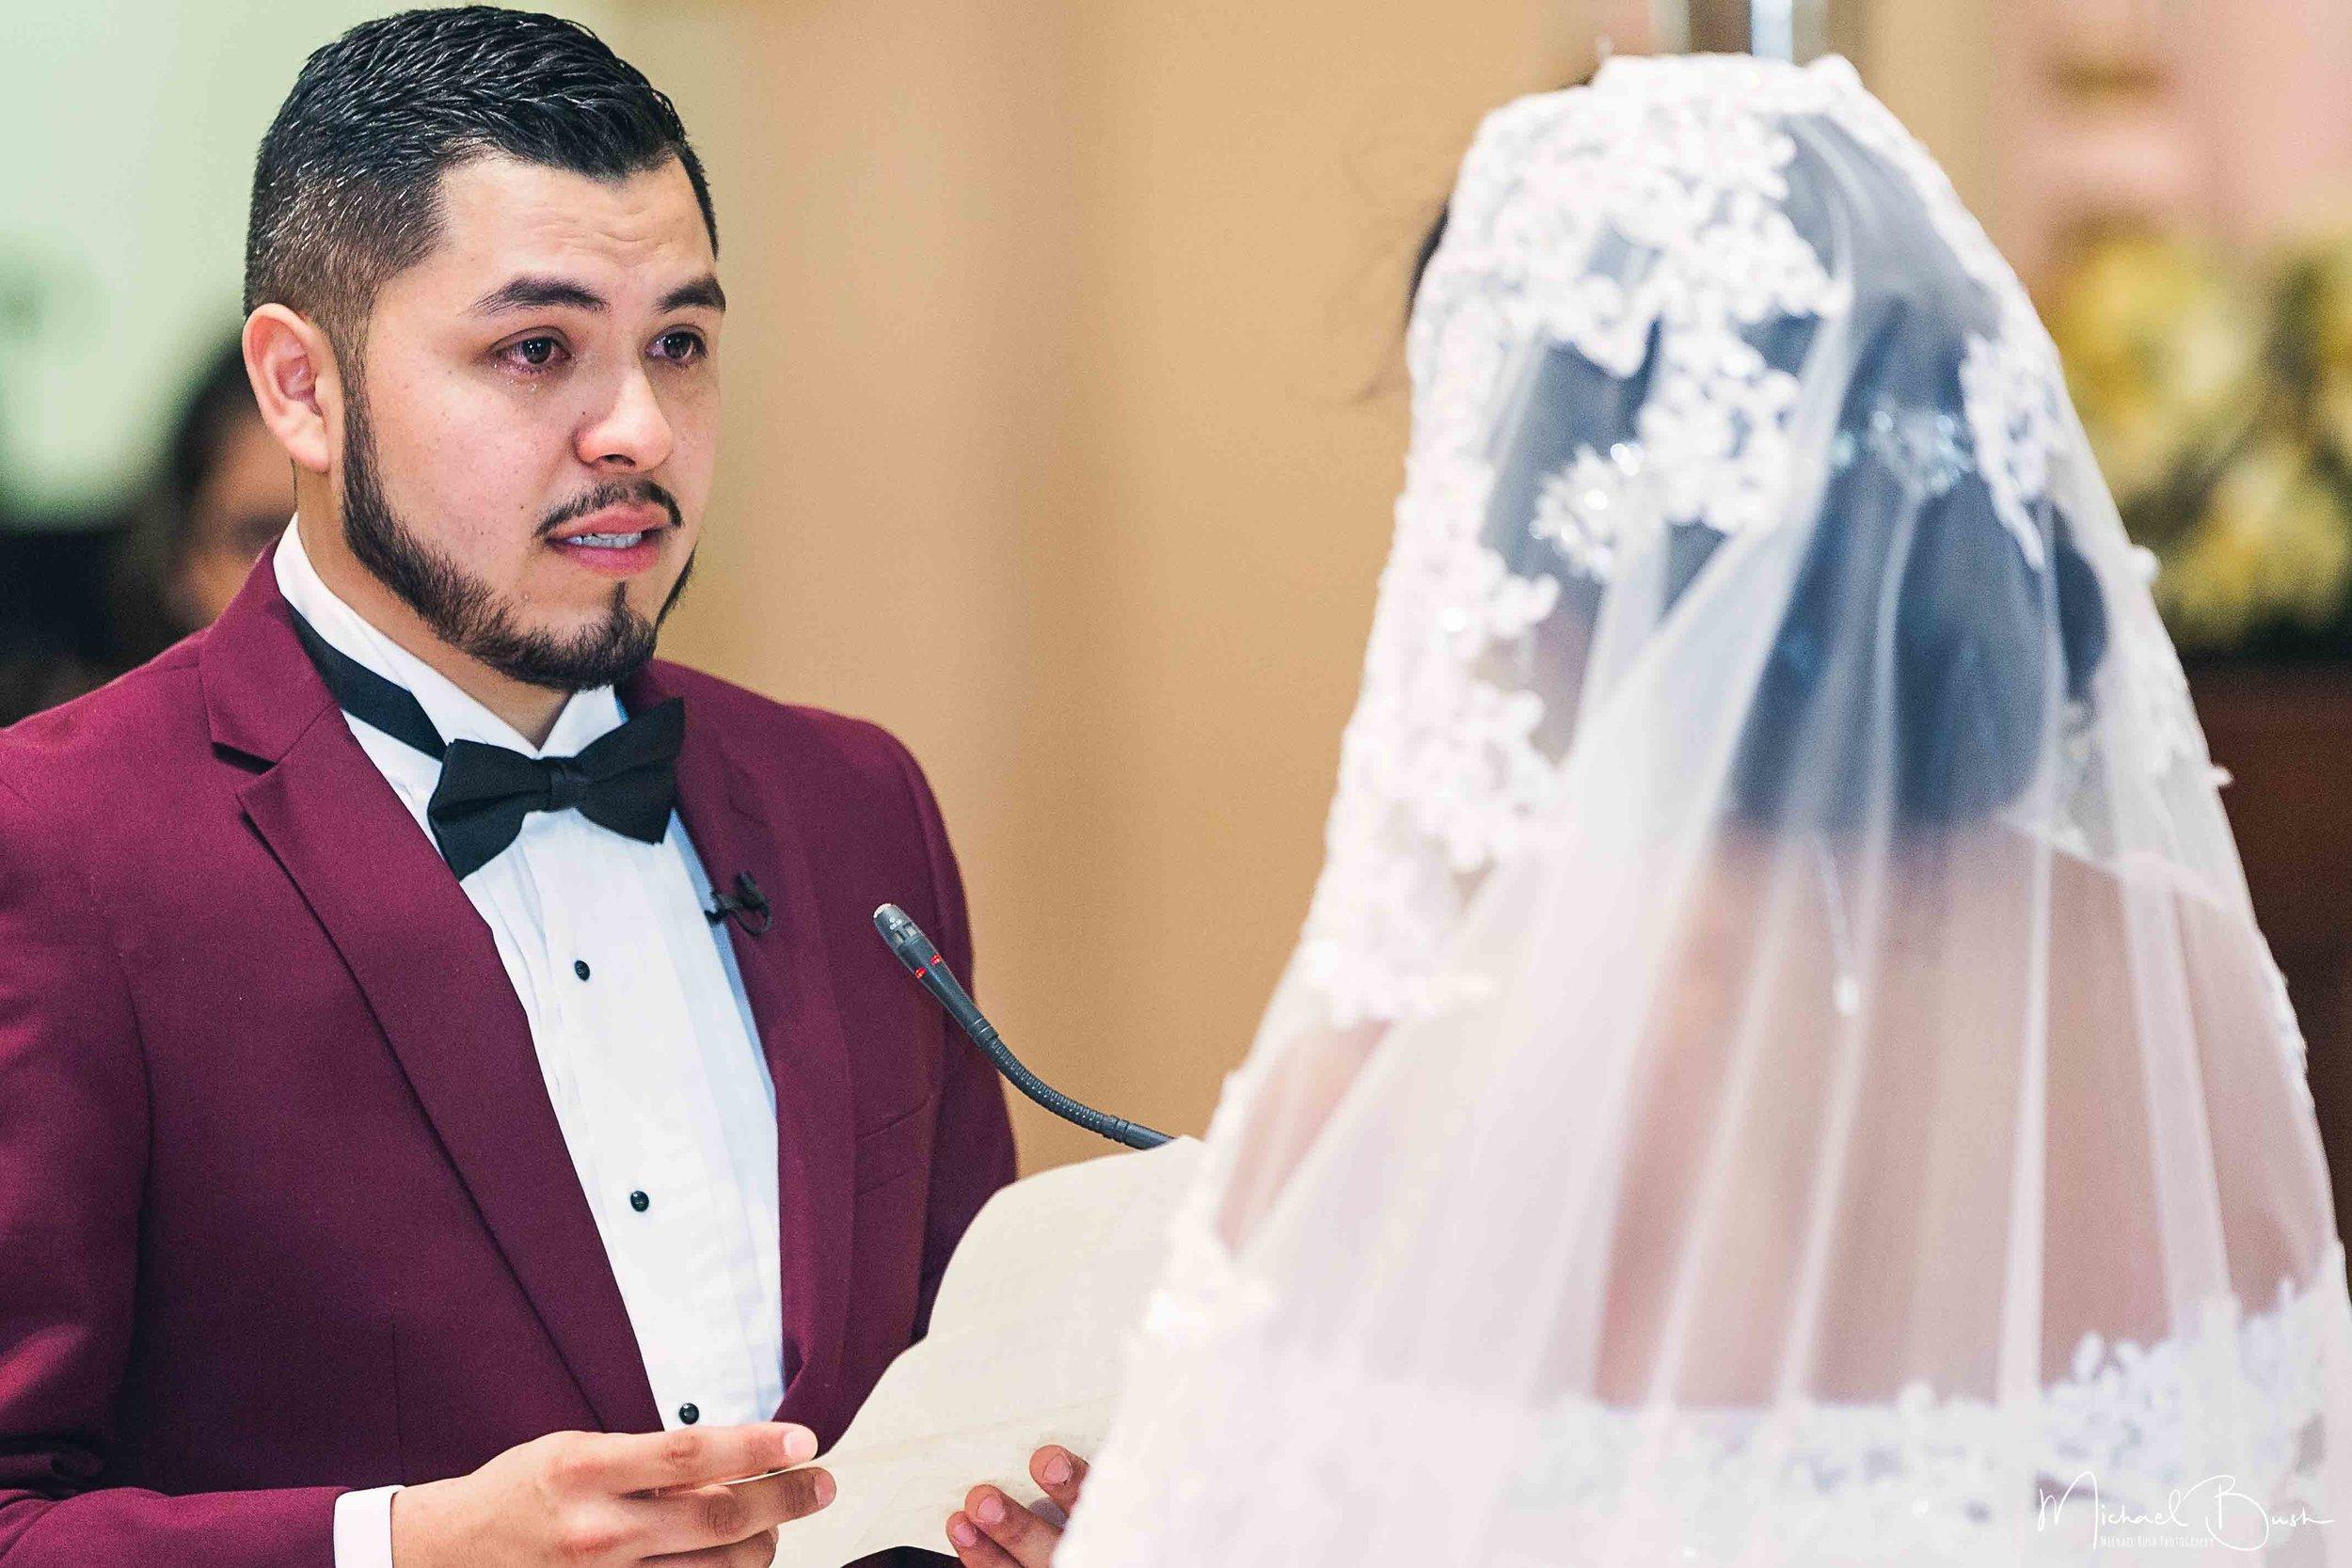 Wedding-Details-Bride-Fort Worth-colors-Ceremony-weddingceremony-brides-groom-ido-church-emotional-groomtears.jpg